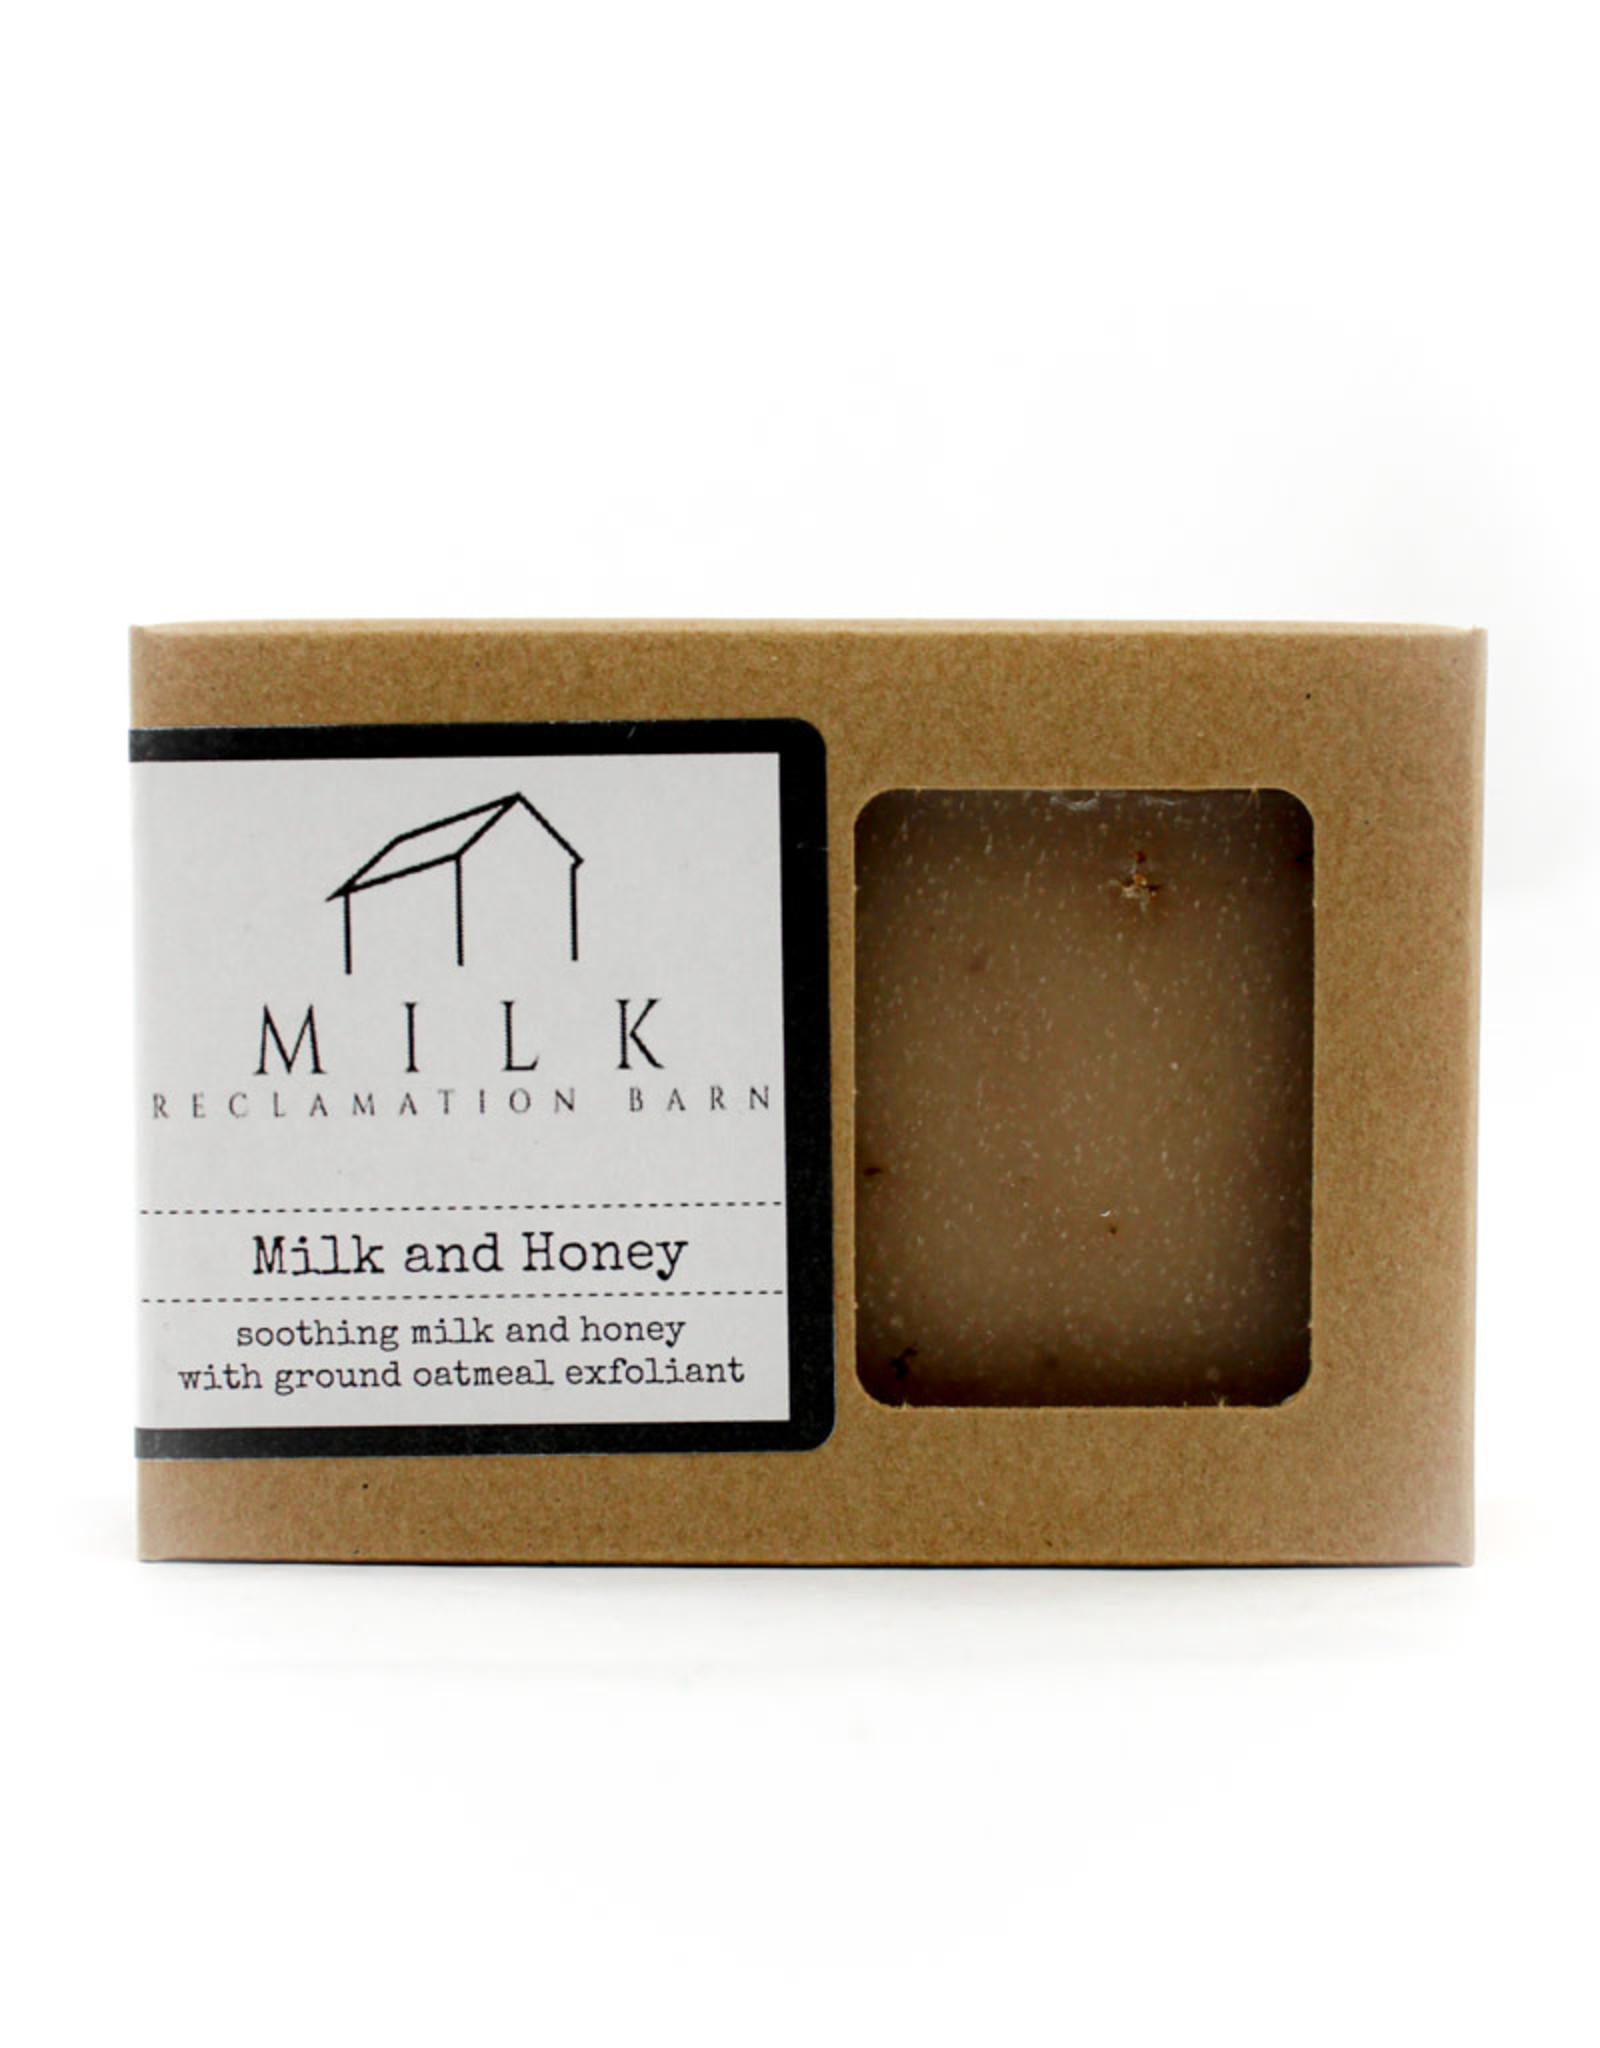 Milk Reclamation Barn Milk and Honey Soap